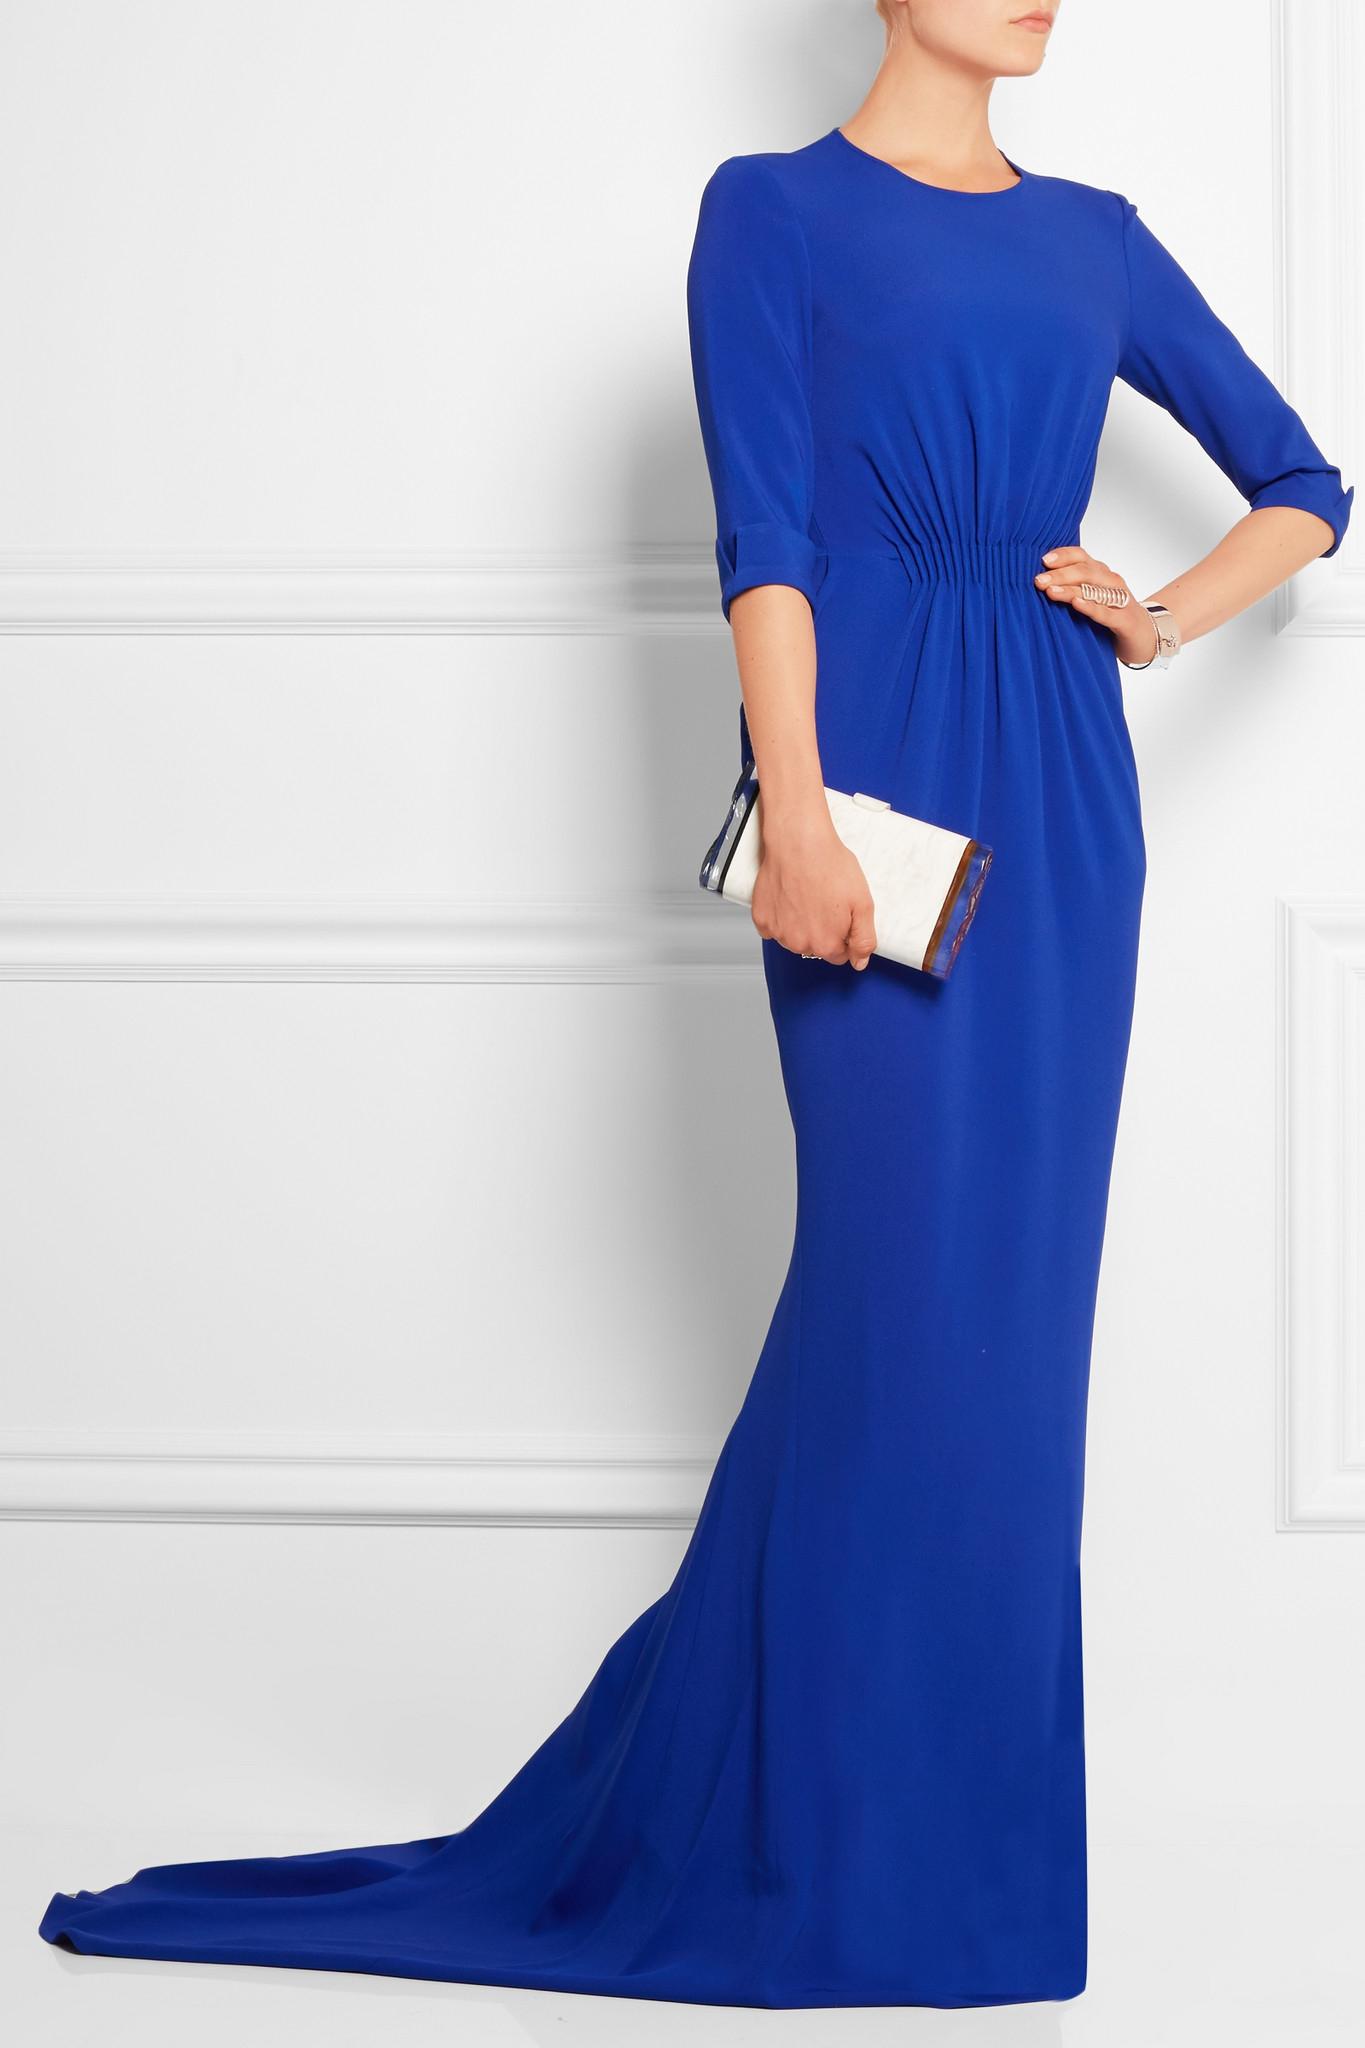 a3016b9717cd Stella McCartney Crepe Gown in Blue - Lyst